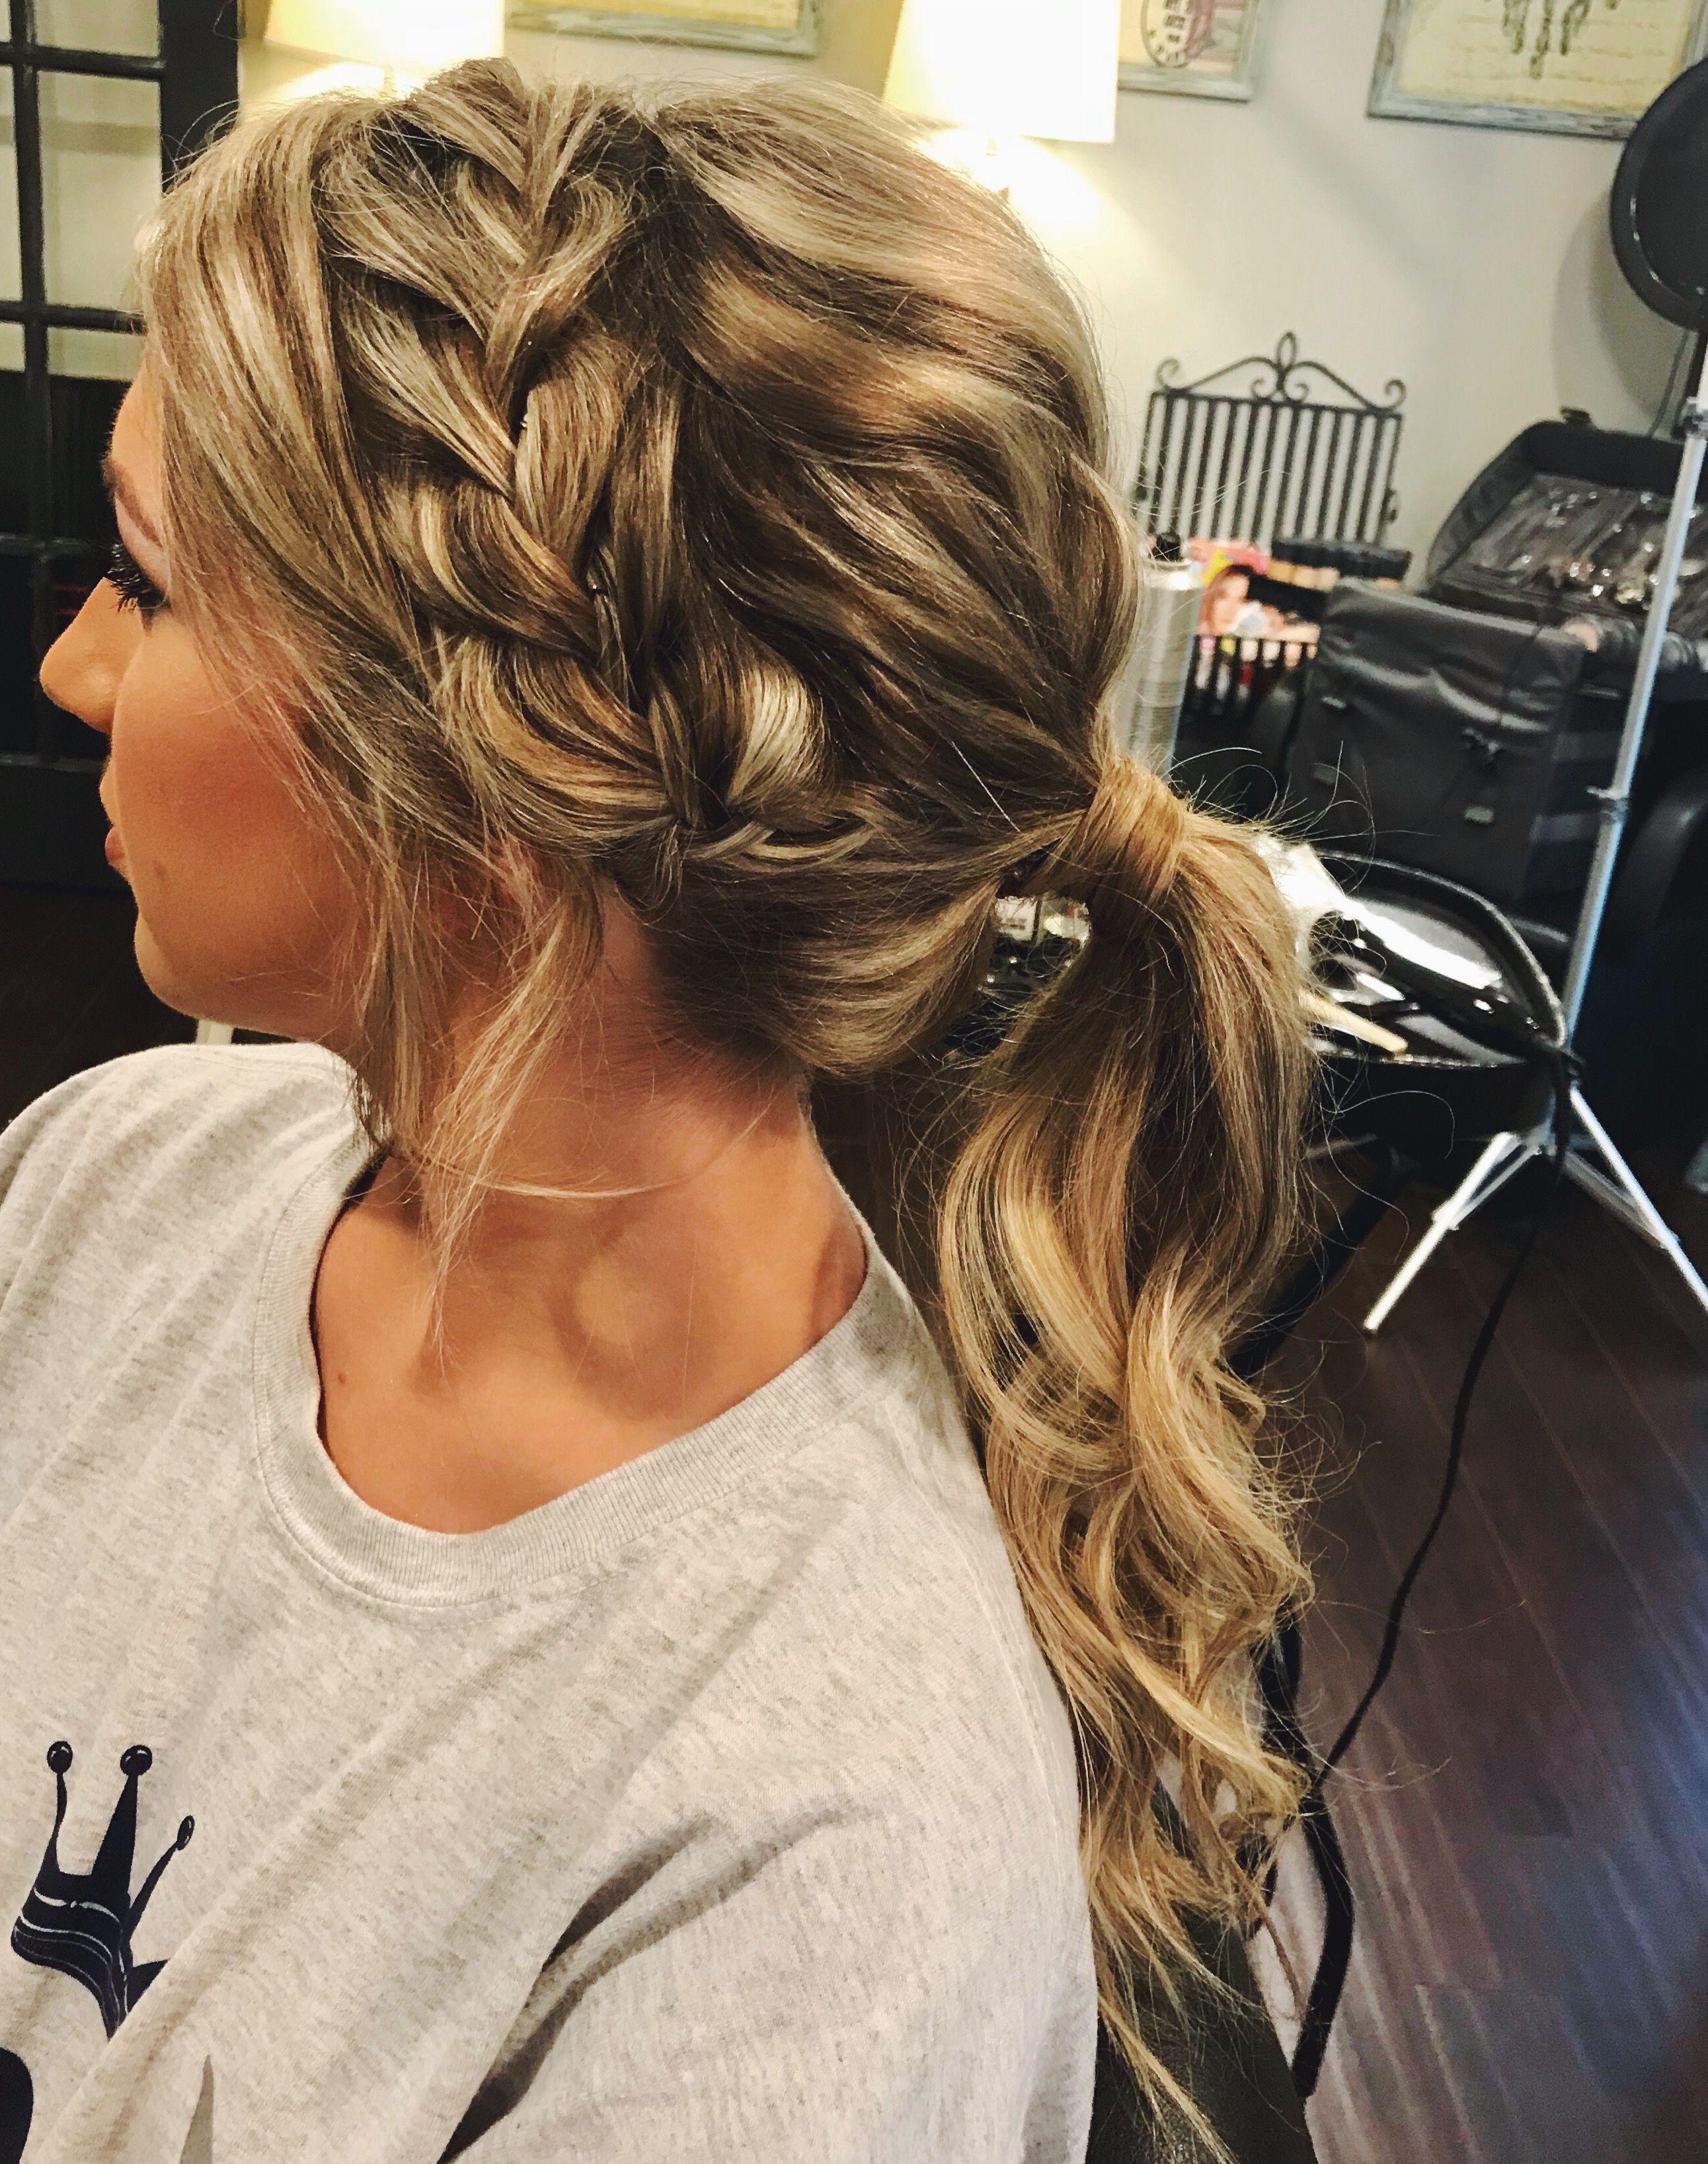 prom hair - ponytail updo braid | hair in 2019 | prom